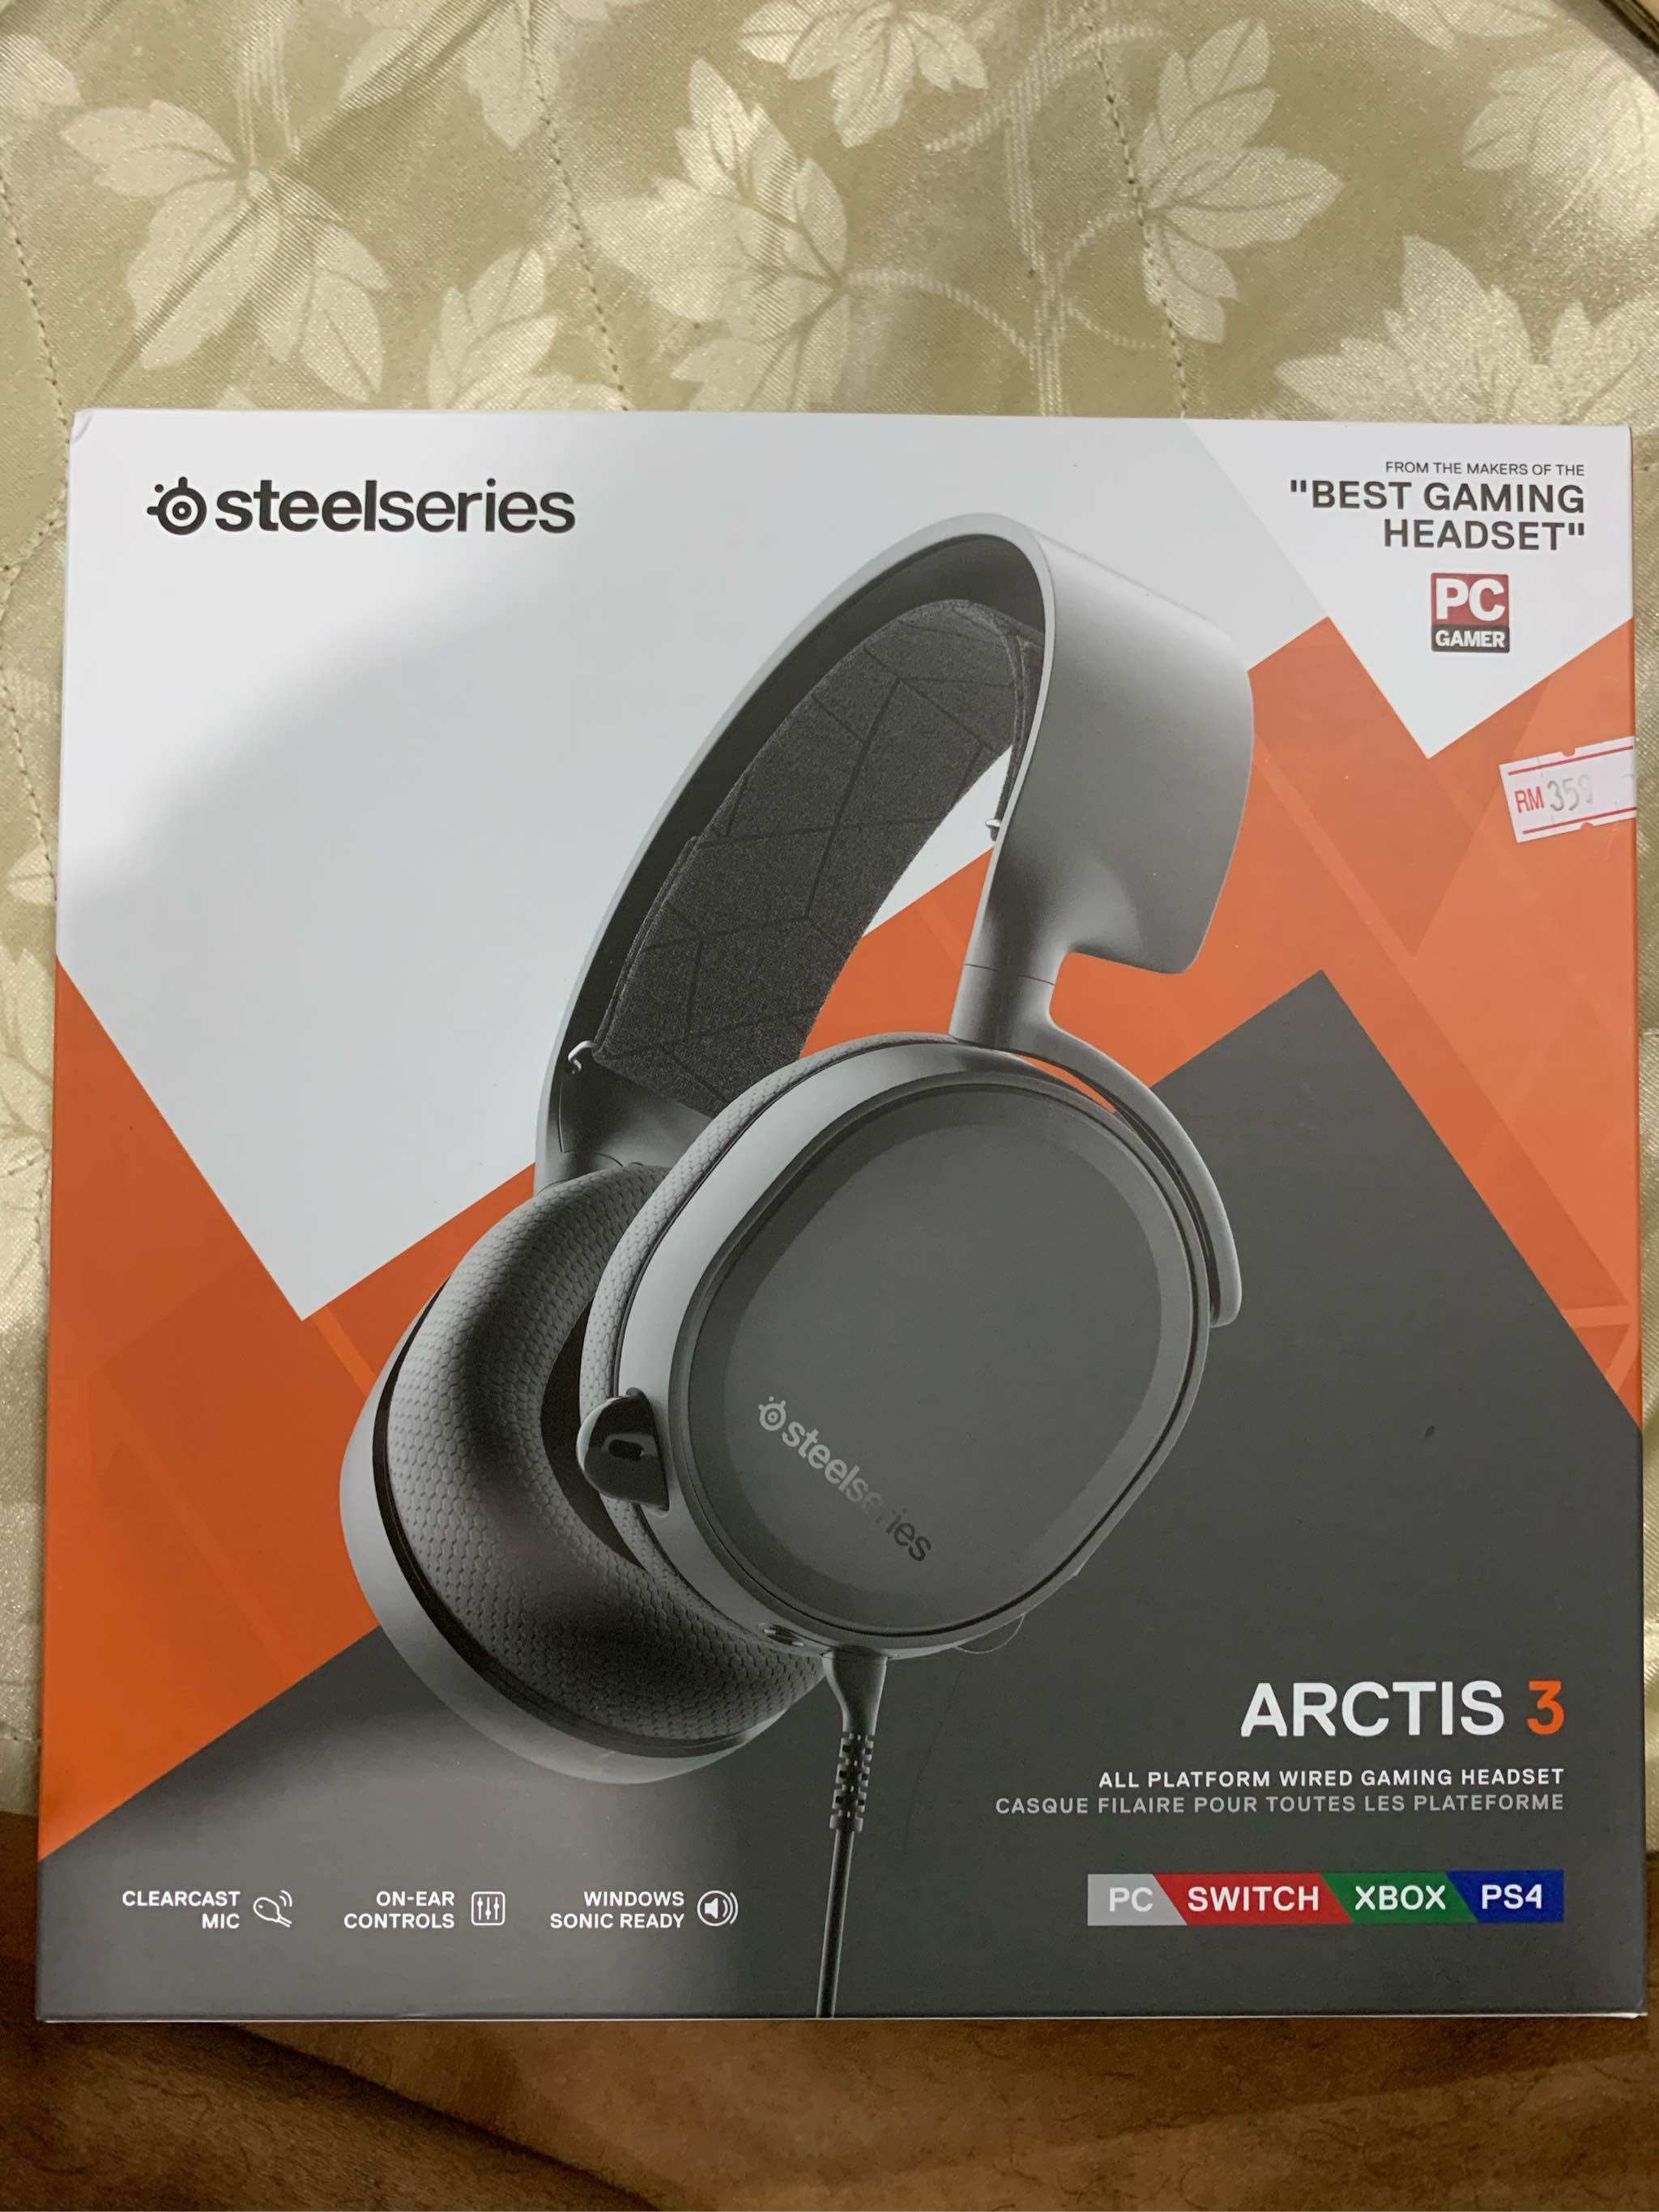 8cbb26a5e91 SteelSeries Arctis 3 7.1 Surround Gaming Headset (Black)   Lazada